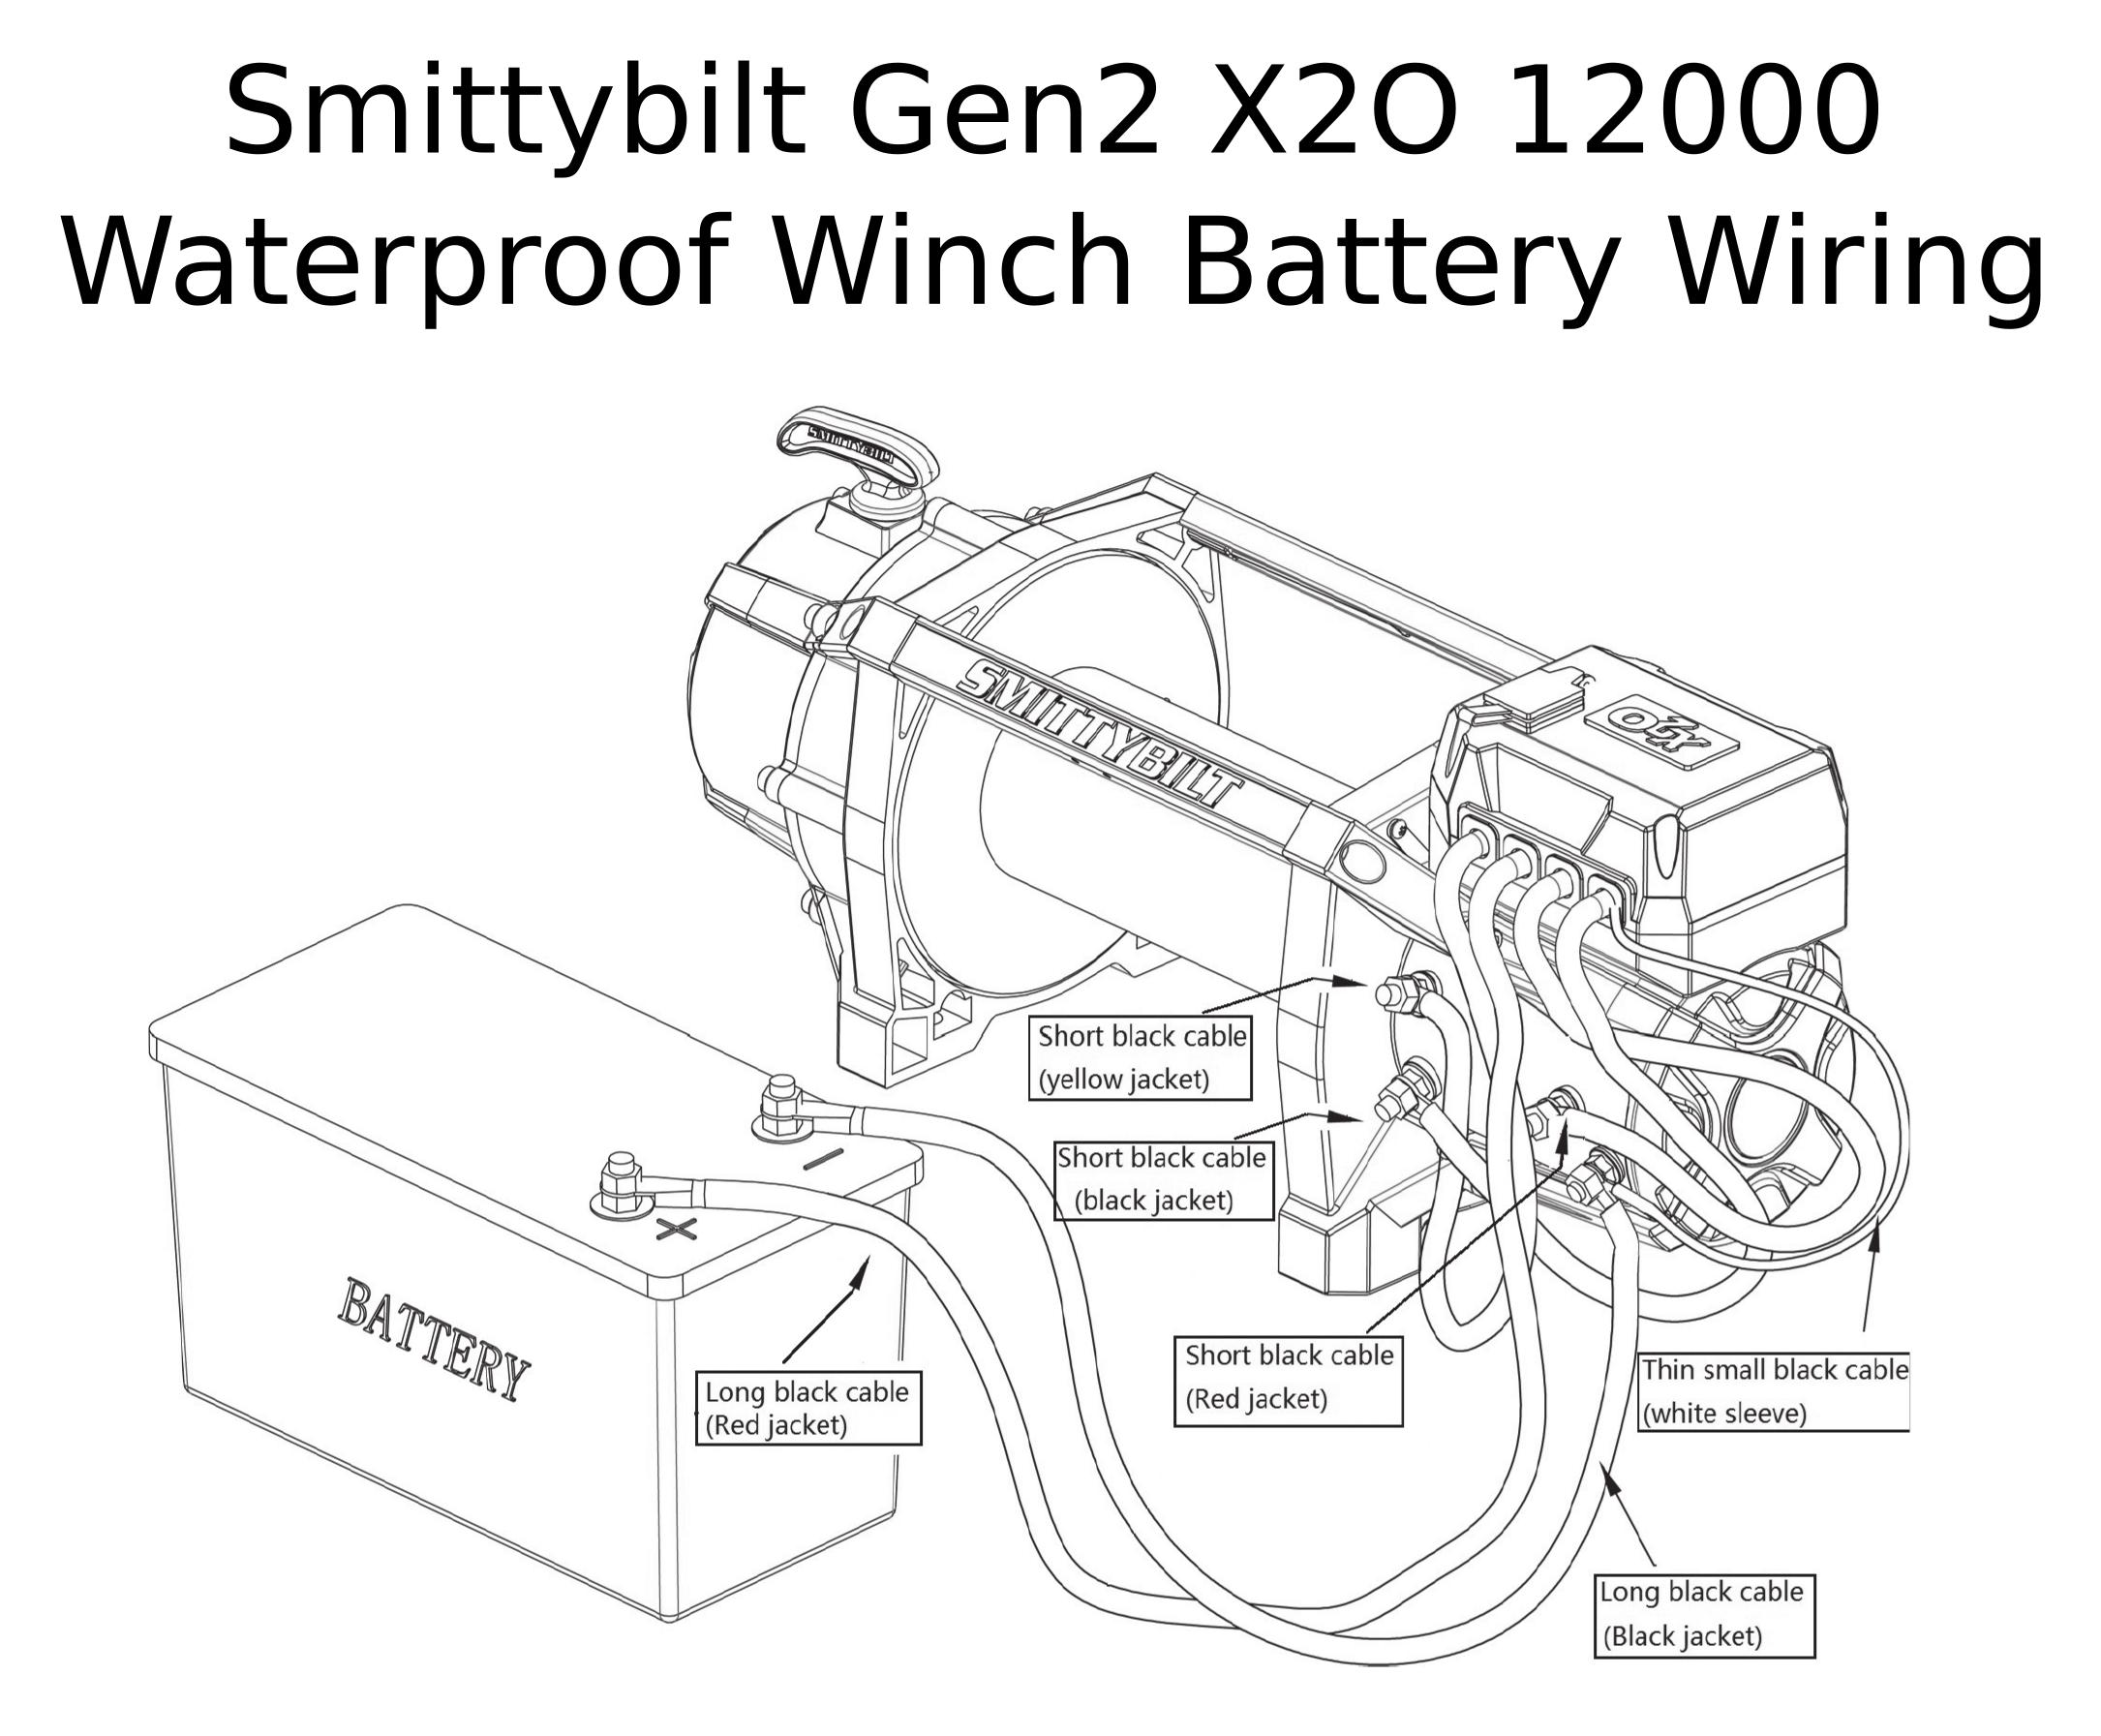 Complete Specs  Smittybilt Gen2 X2o 12000 Waterproof